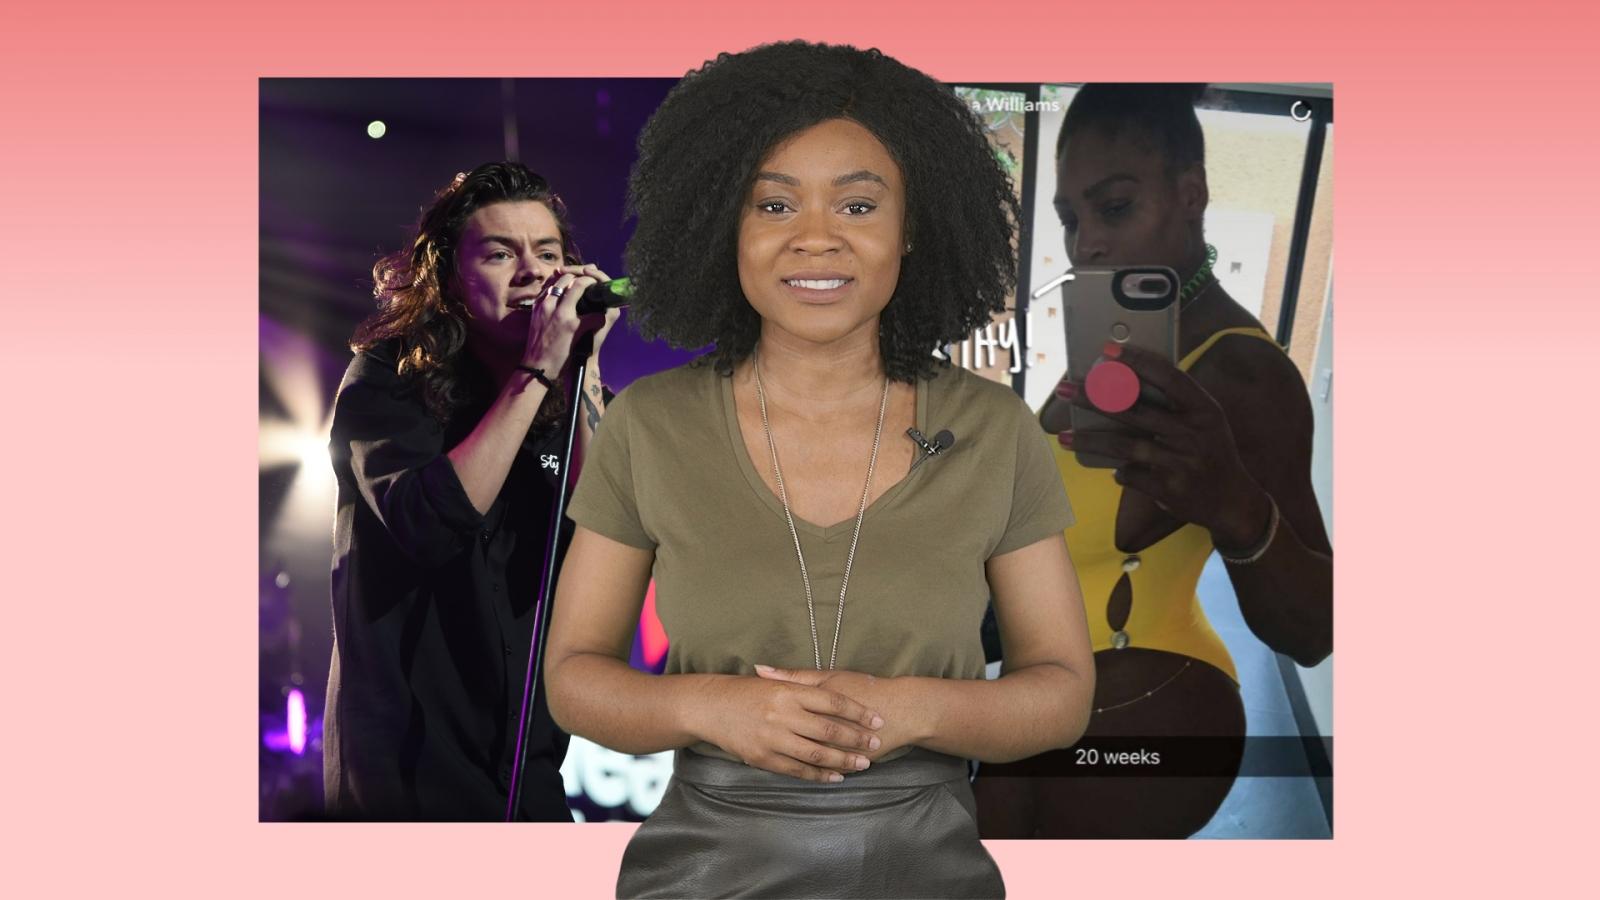 A-list Insider: Serena Williams pregnant, Nicki Minaj keeps Westminster Bridge footage, Harry Styles backlash